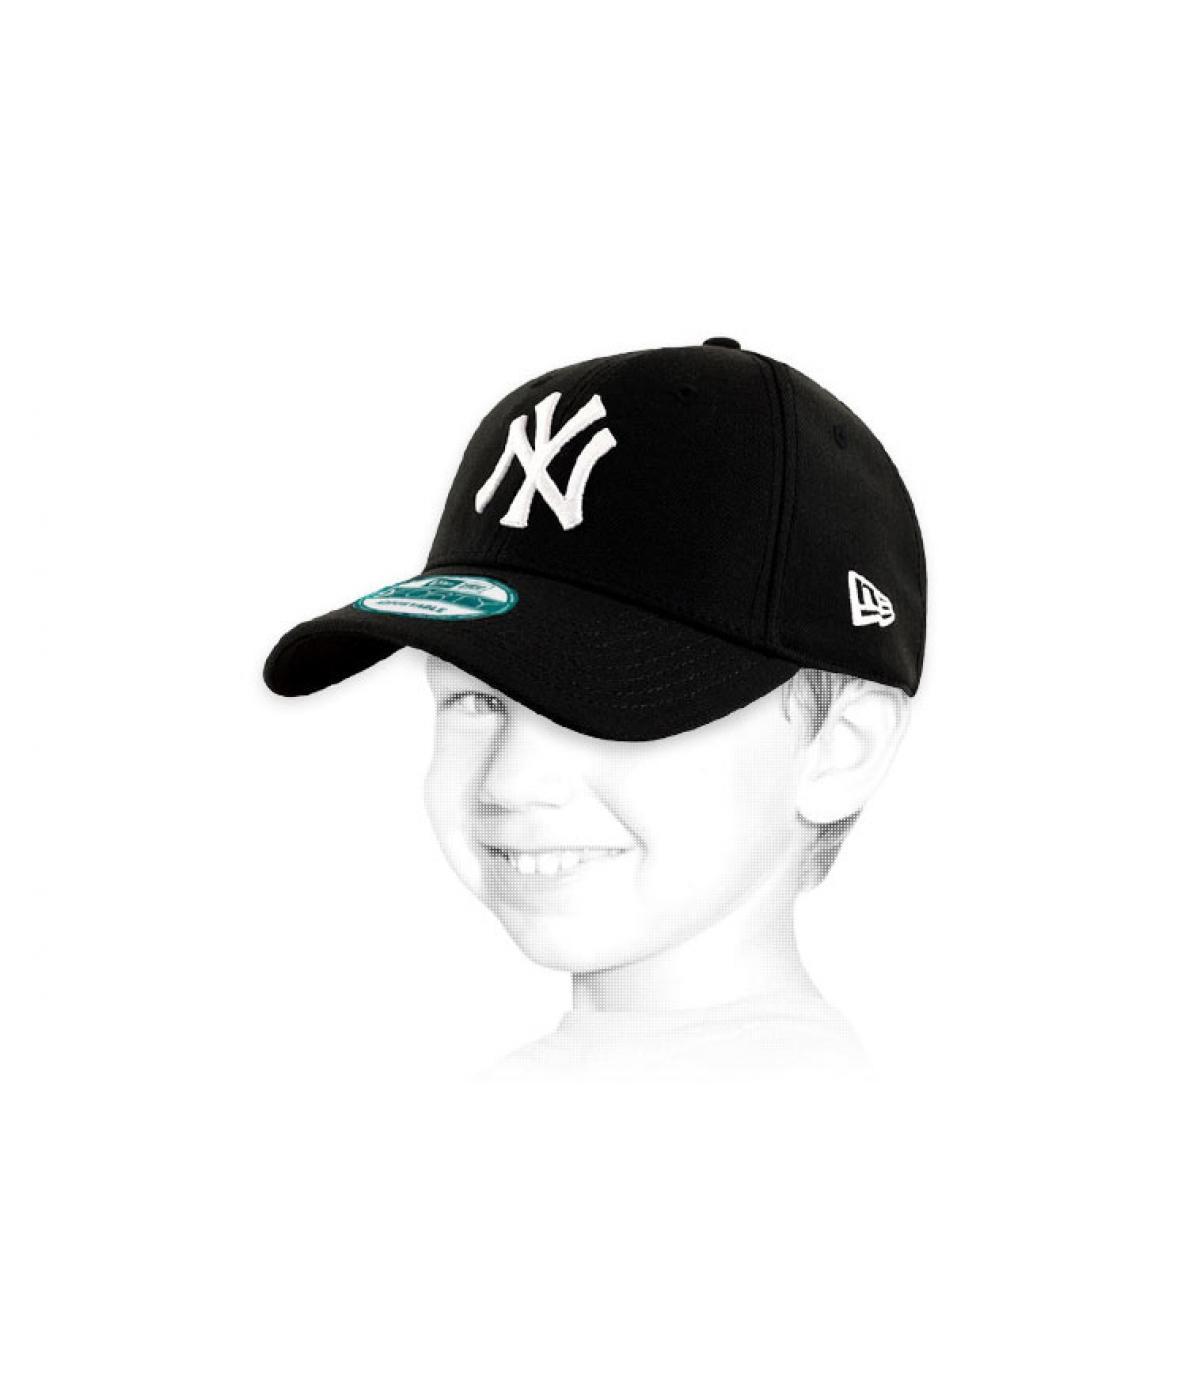 Détails Child 9Forty NY black - image 2